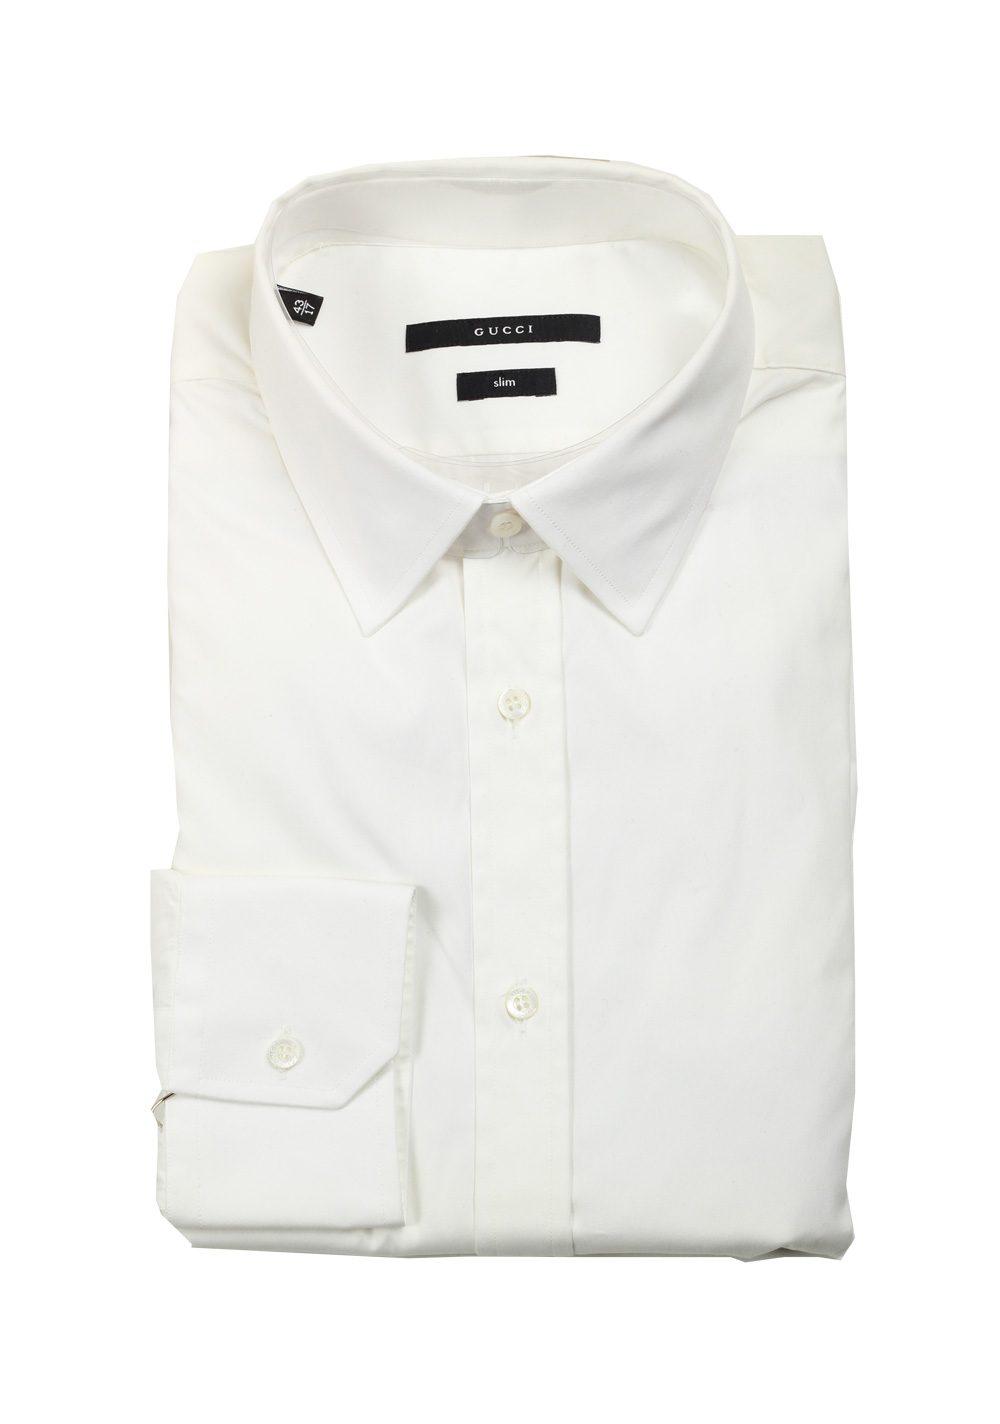 Cheap off white dress shirts